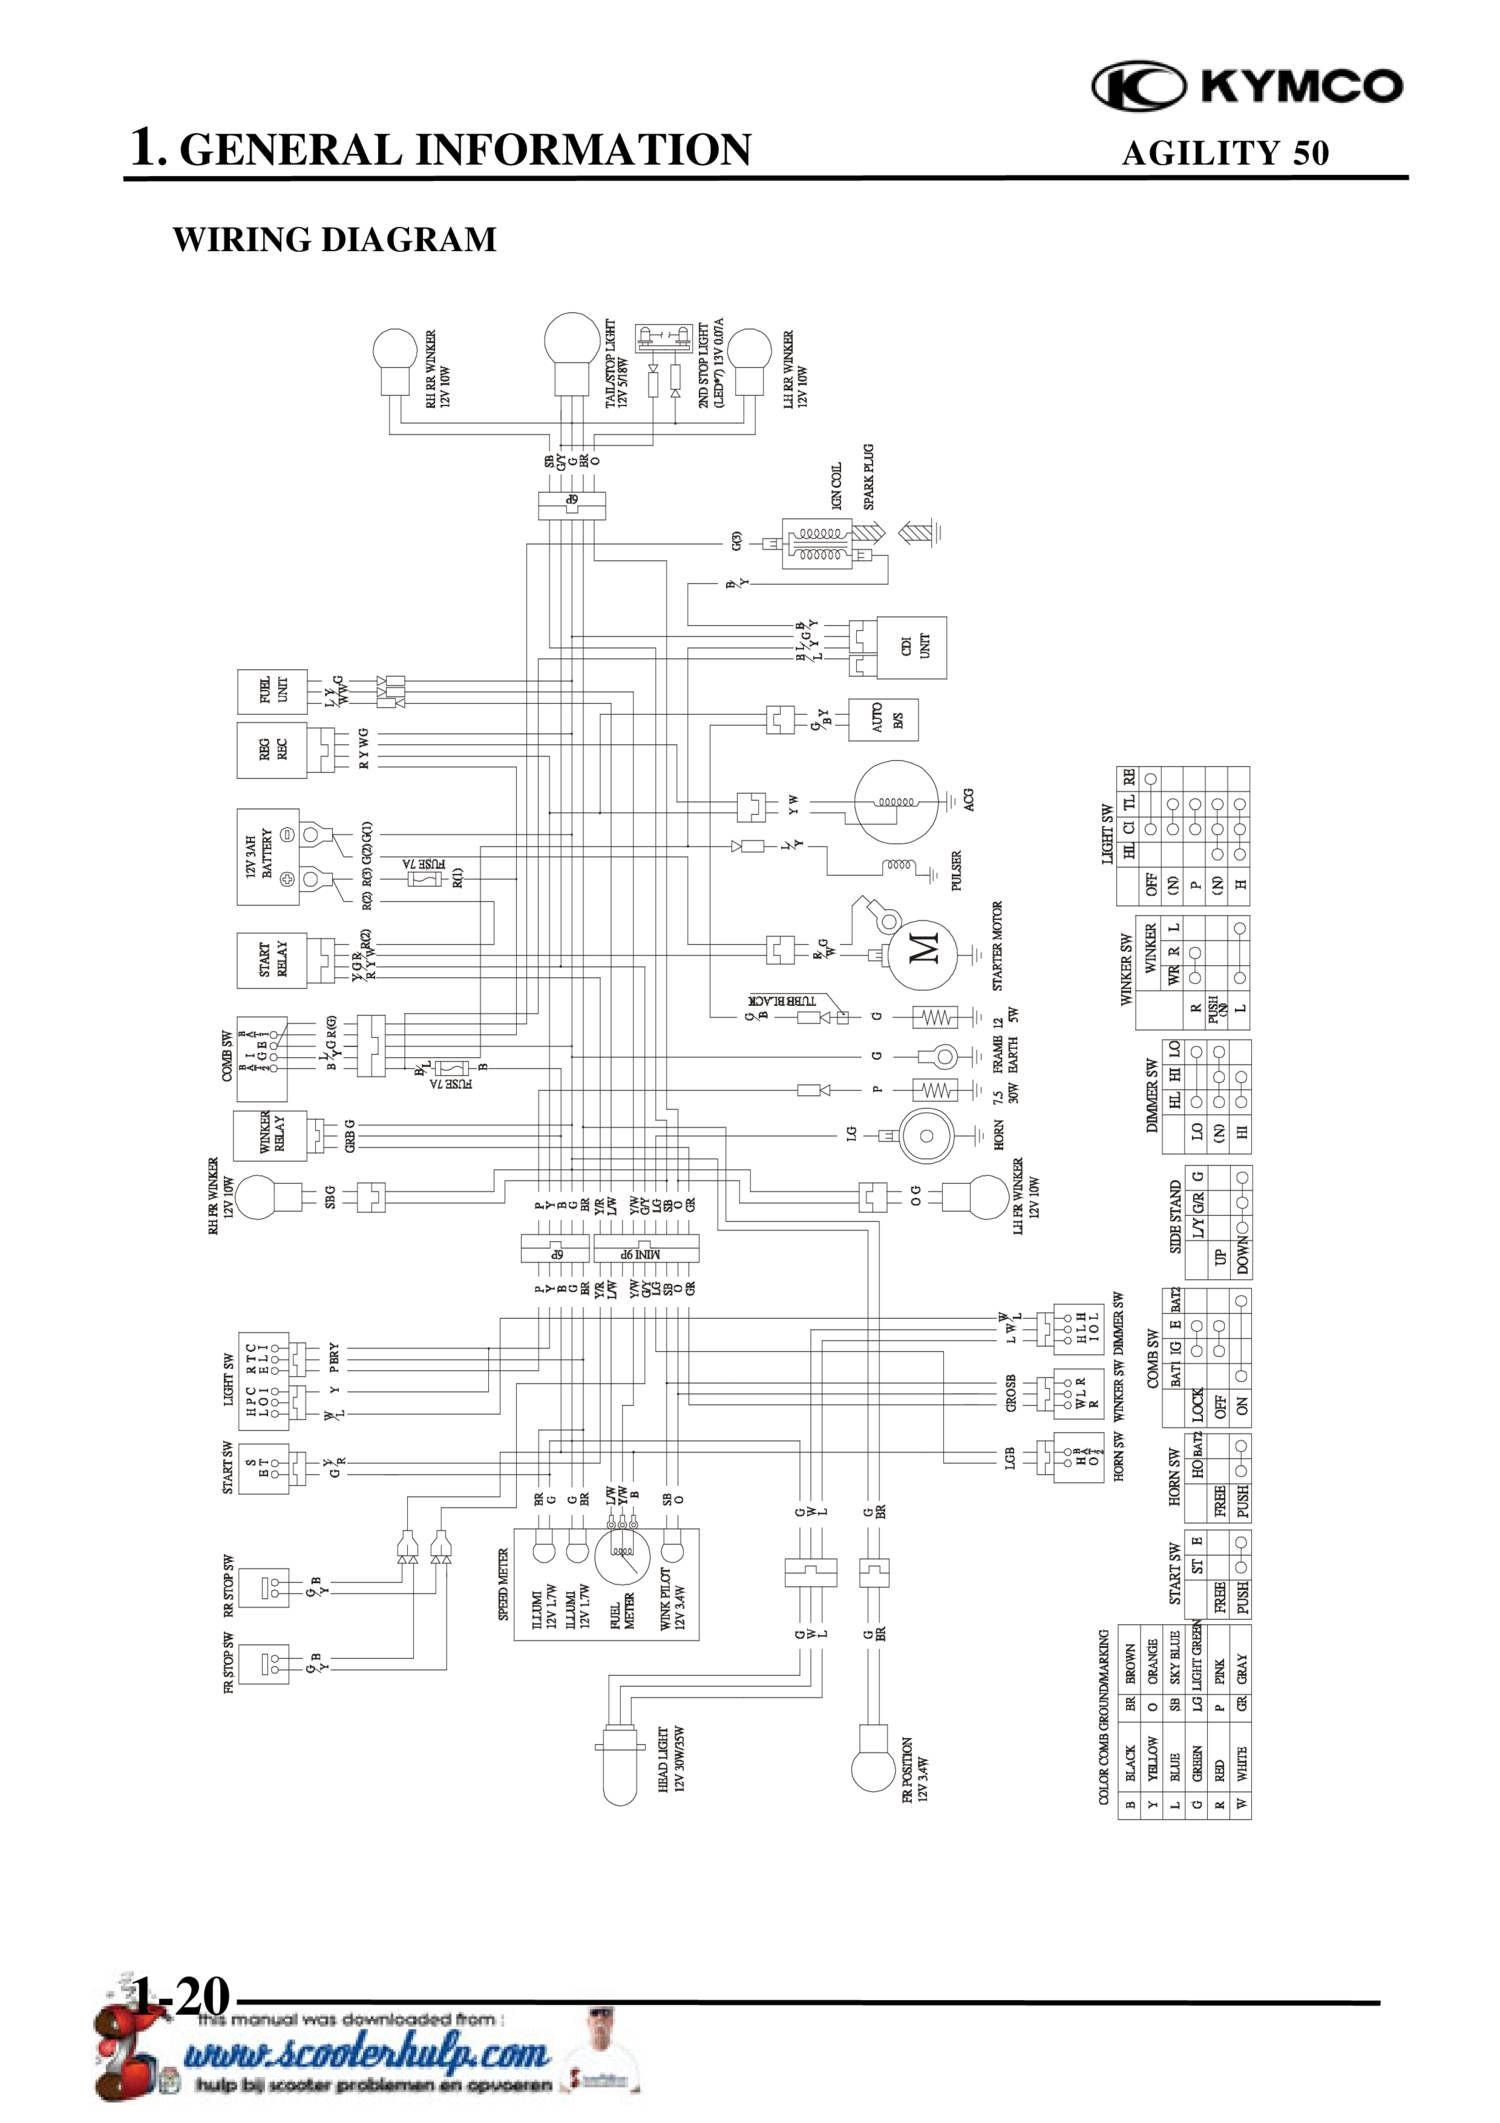 Kymco Agility 50 Wiring Diagram  U2013 Volovets Info